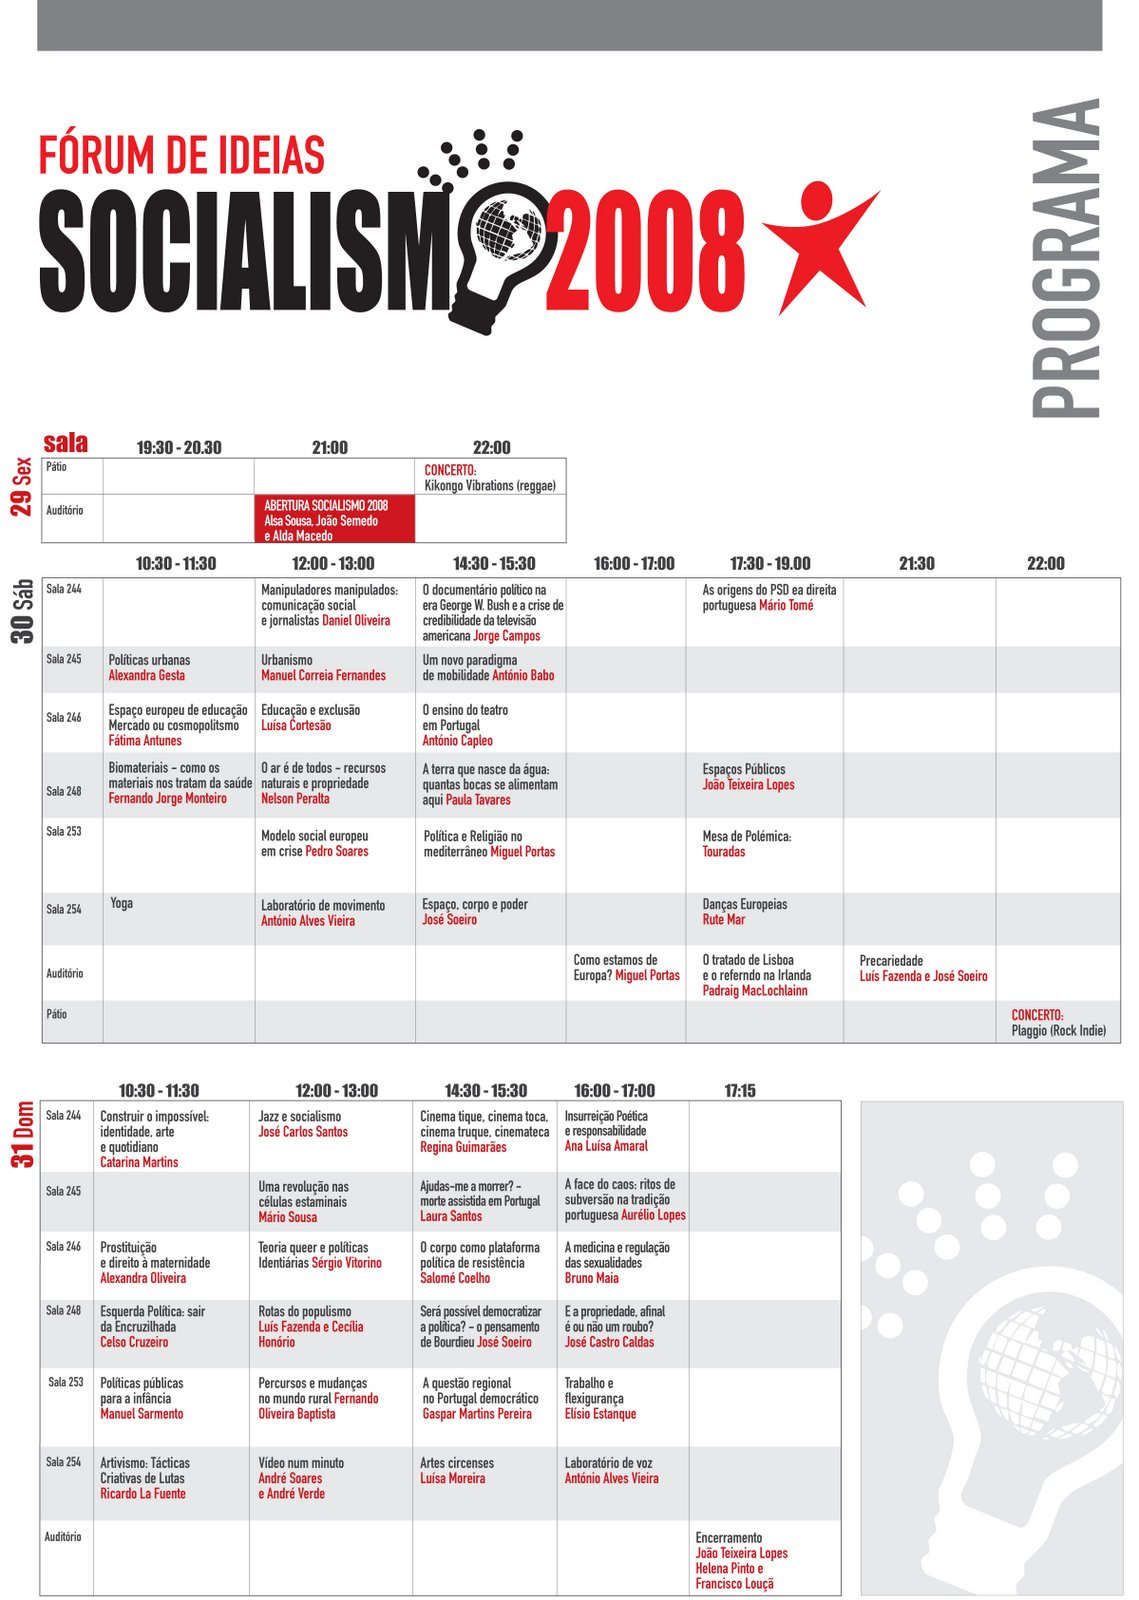 Fórum de Ideias Socialismo 2008: Programa